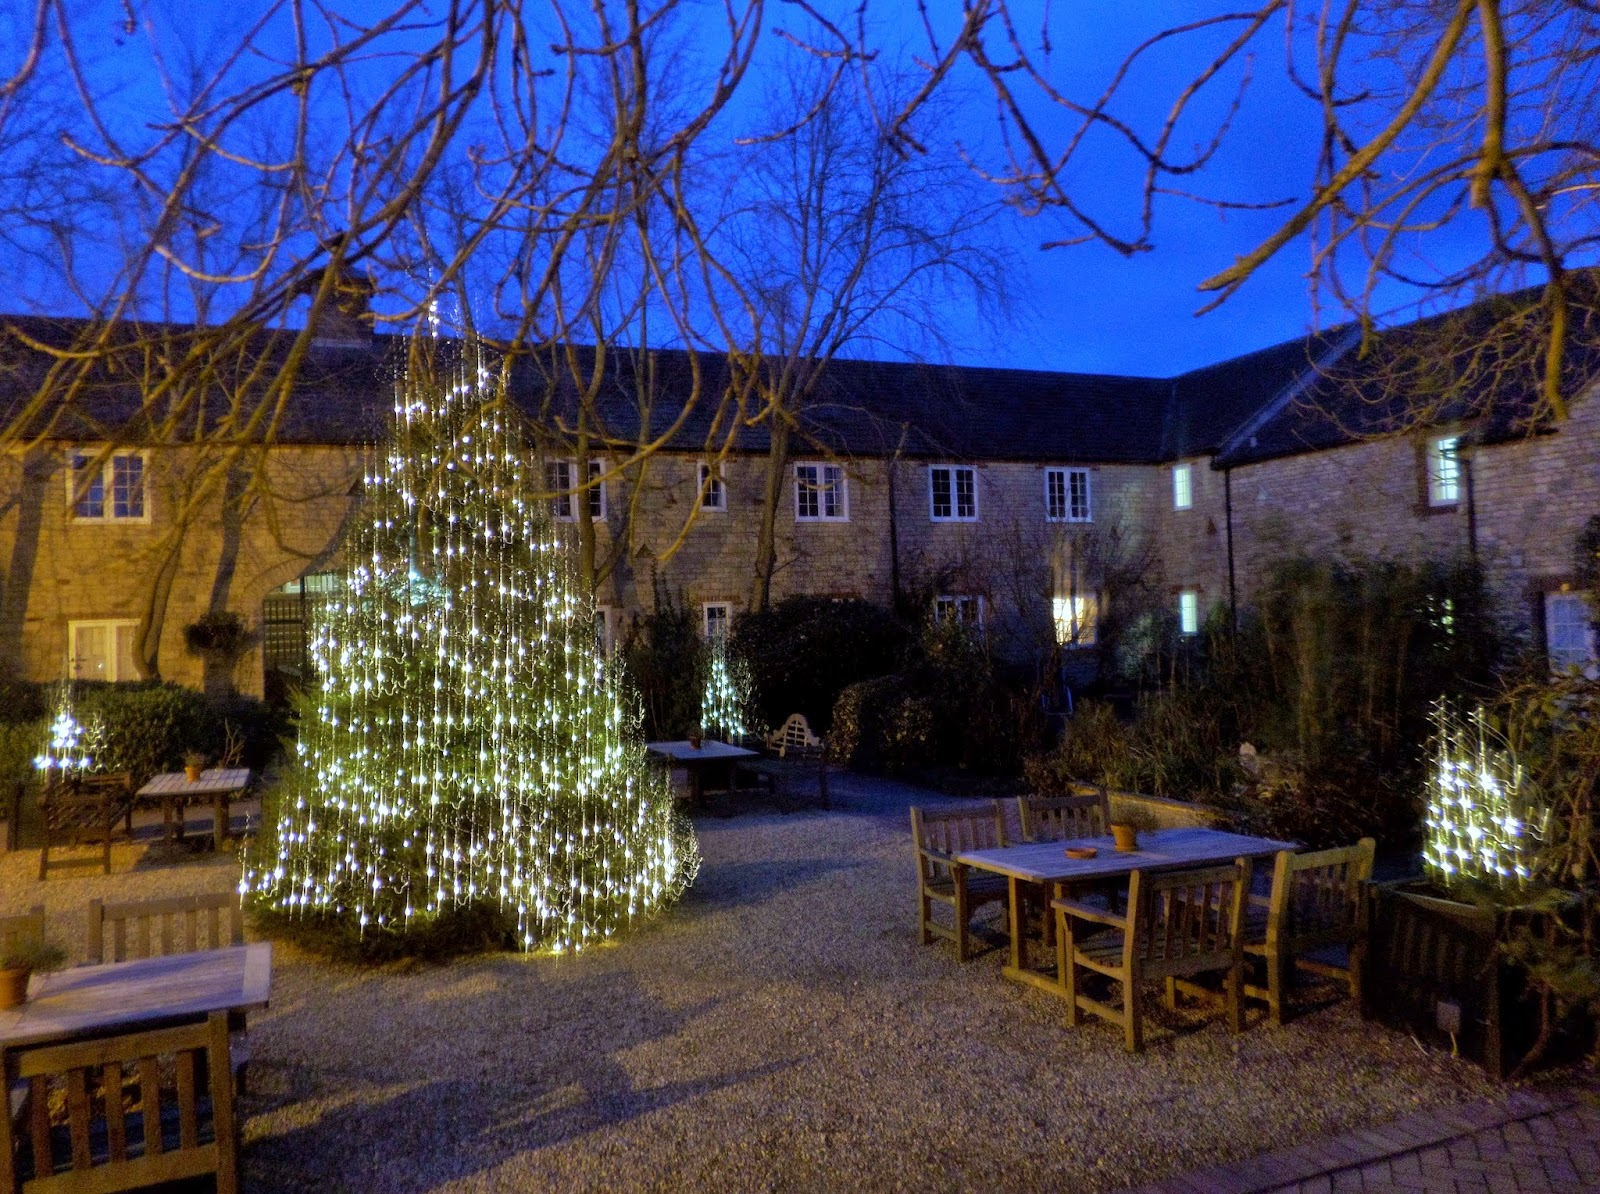 digby farm - christmas trees decorations & more north luffenham